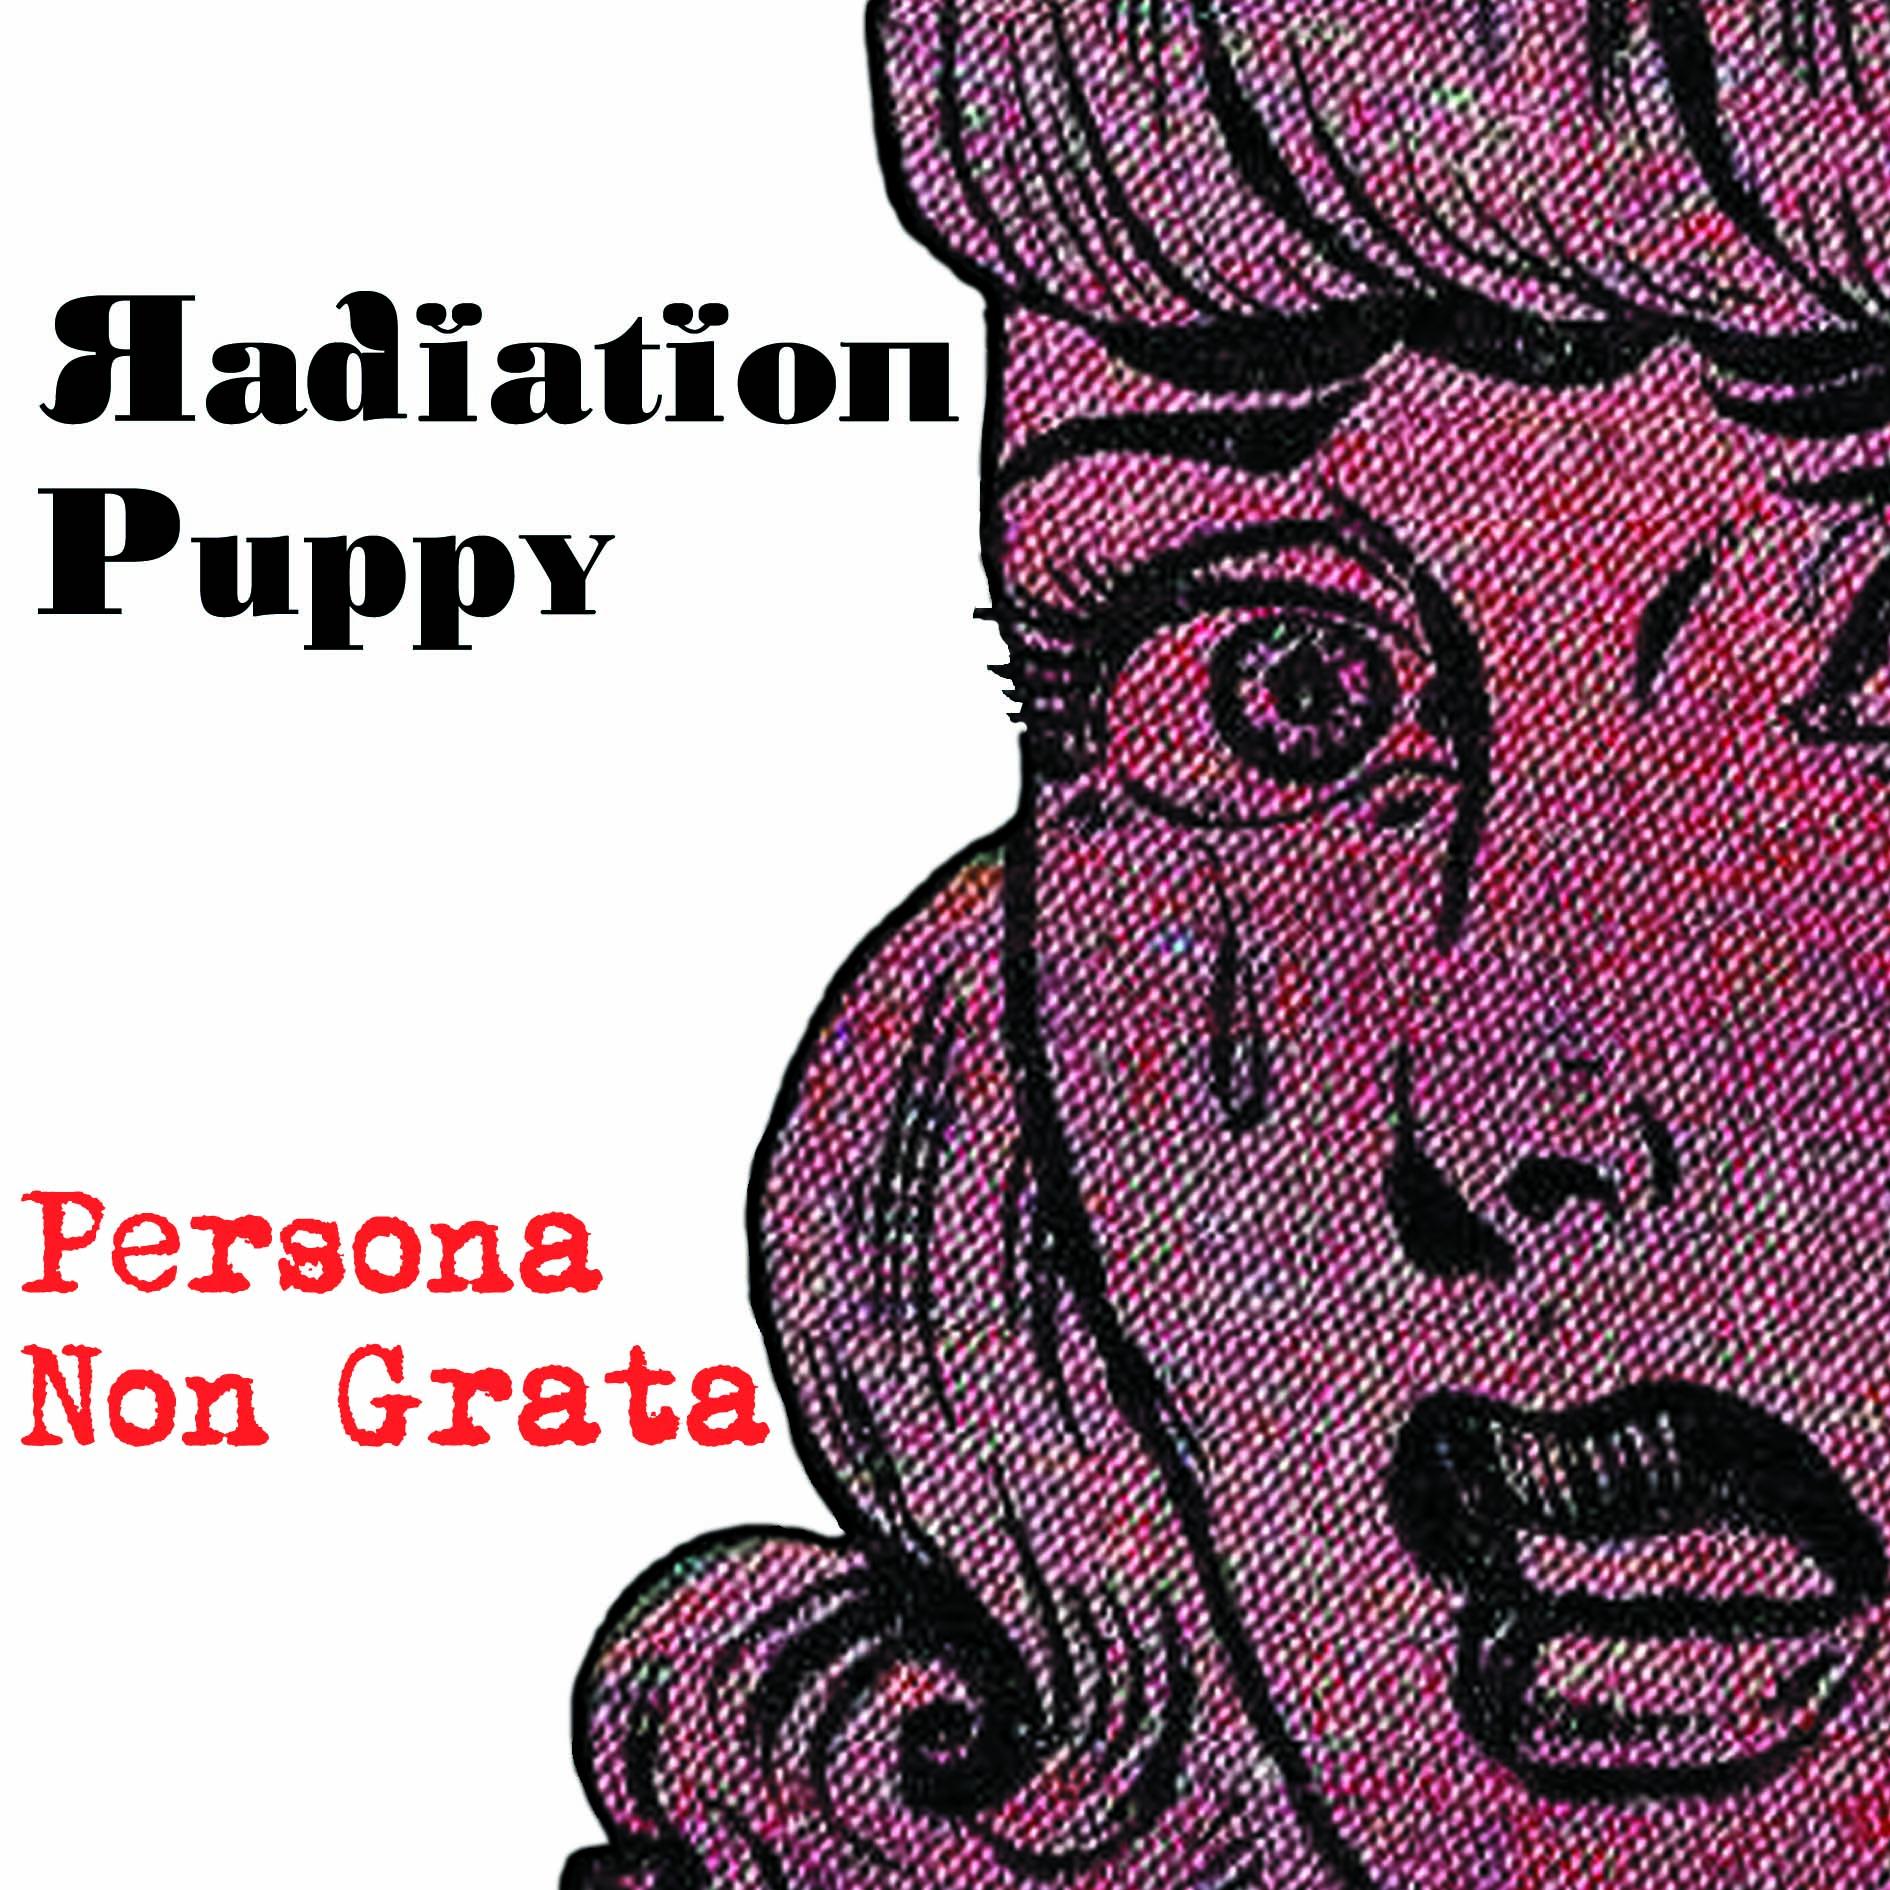 Radiation Puppy Cover Art.jpg